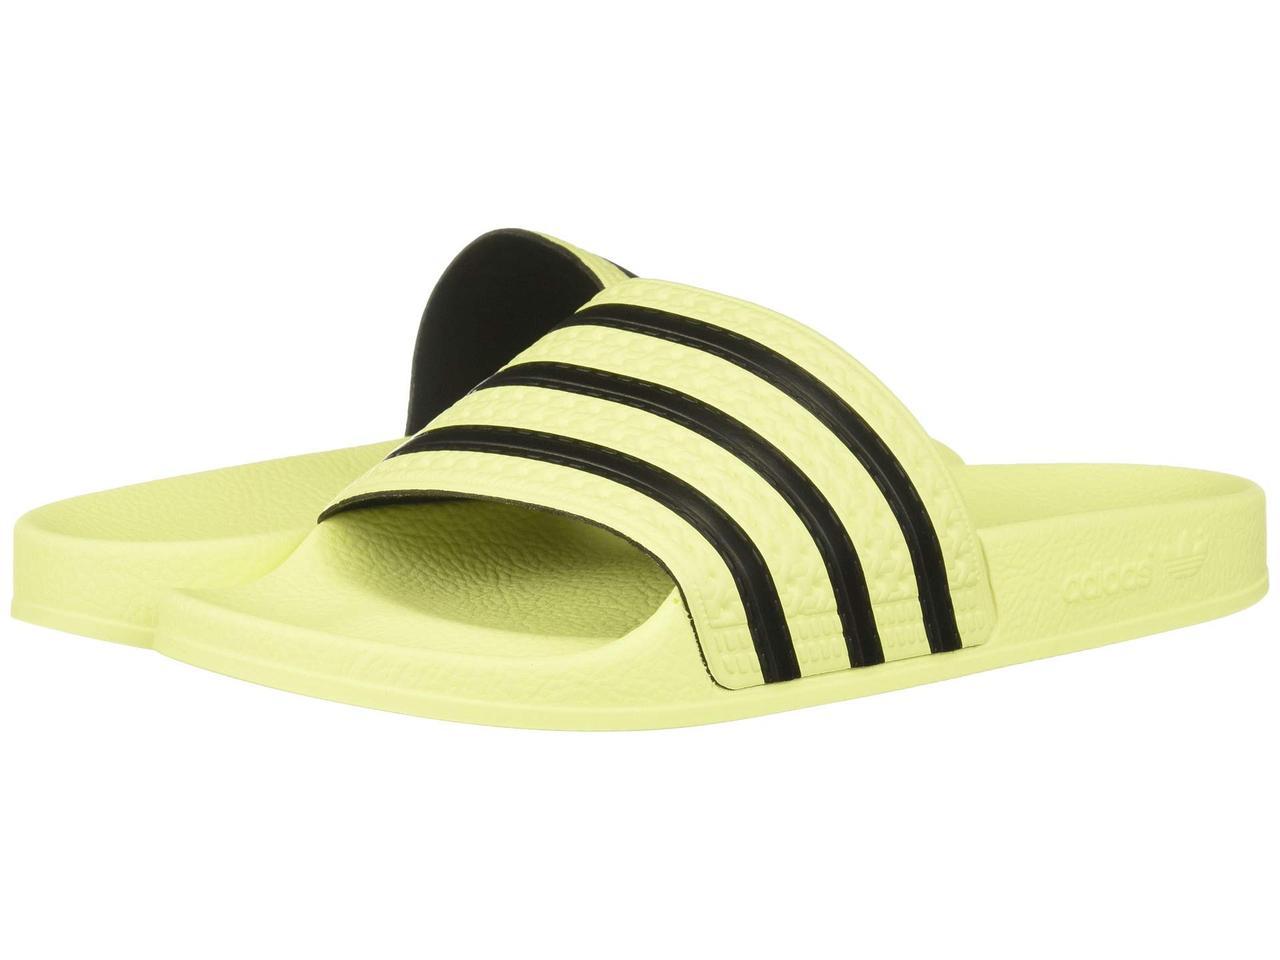 4d7b297855c Сандали/Вьетнамки (Оригинал) adidas Adilette Slide Ice Yellow/Ice  Yellow/Core Black: продажа, цена в Киеве. ...